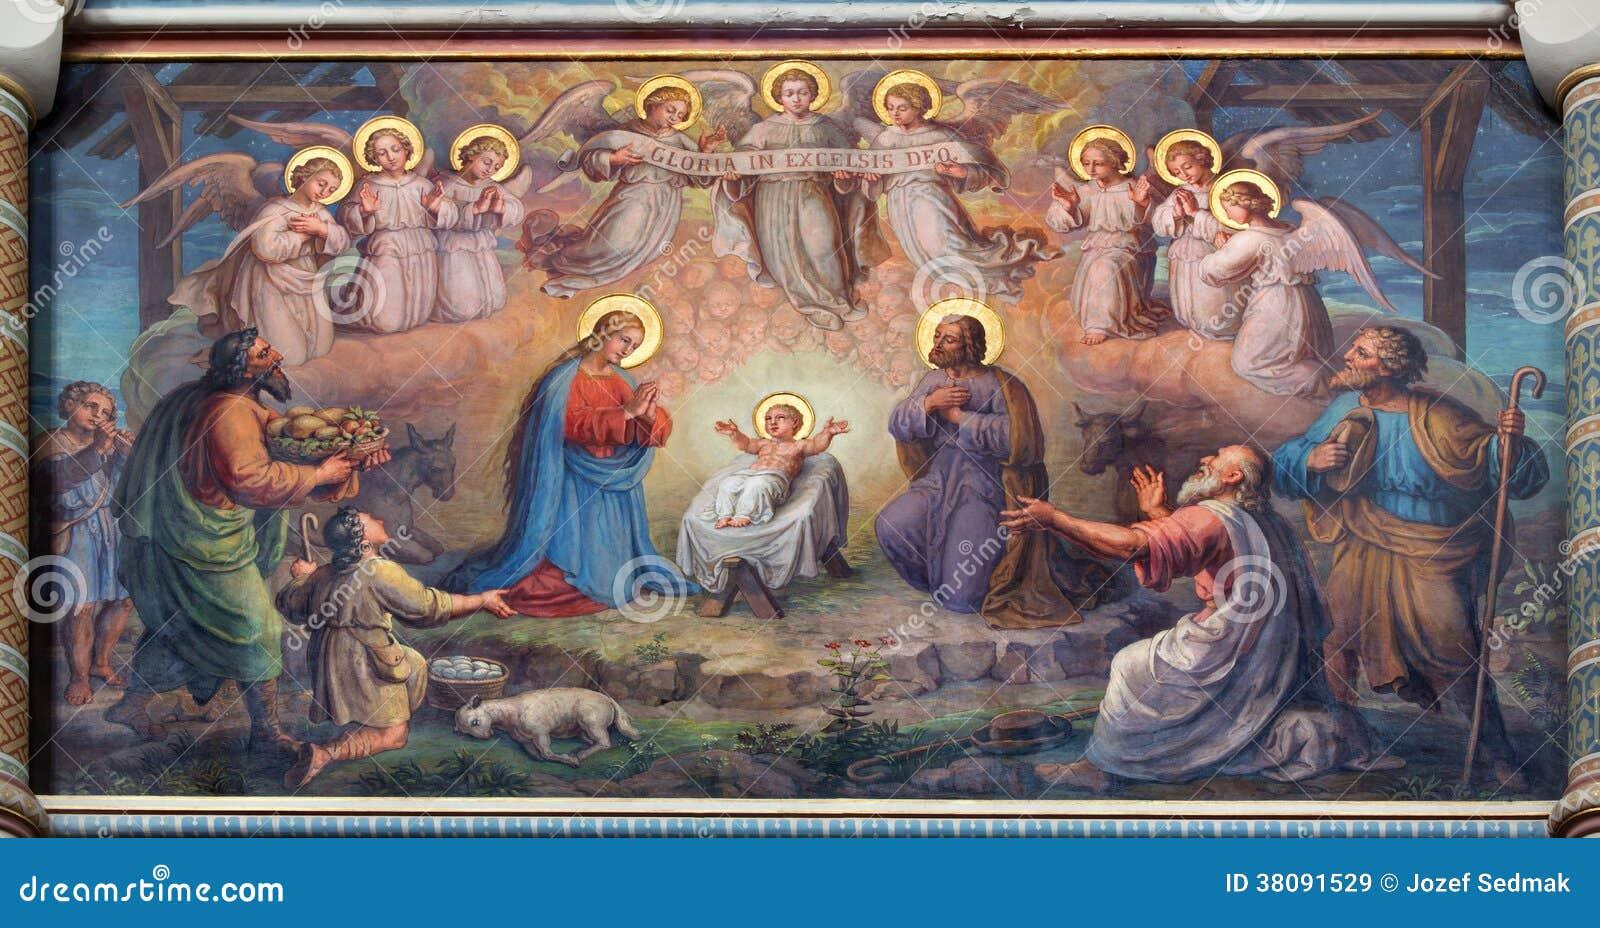 Wenen - Fresko van Geboorte van Christusscène door Josef Kastner vanaf 1906 - 1911 in Carmelites-kerk in Dobling.